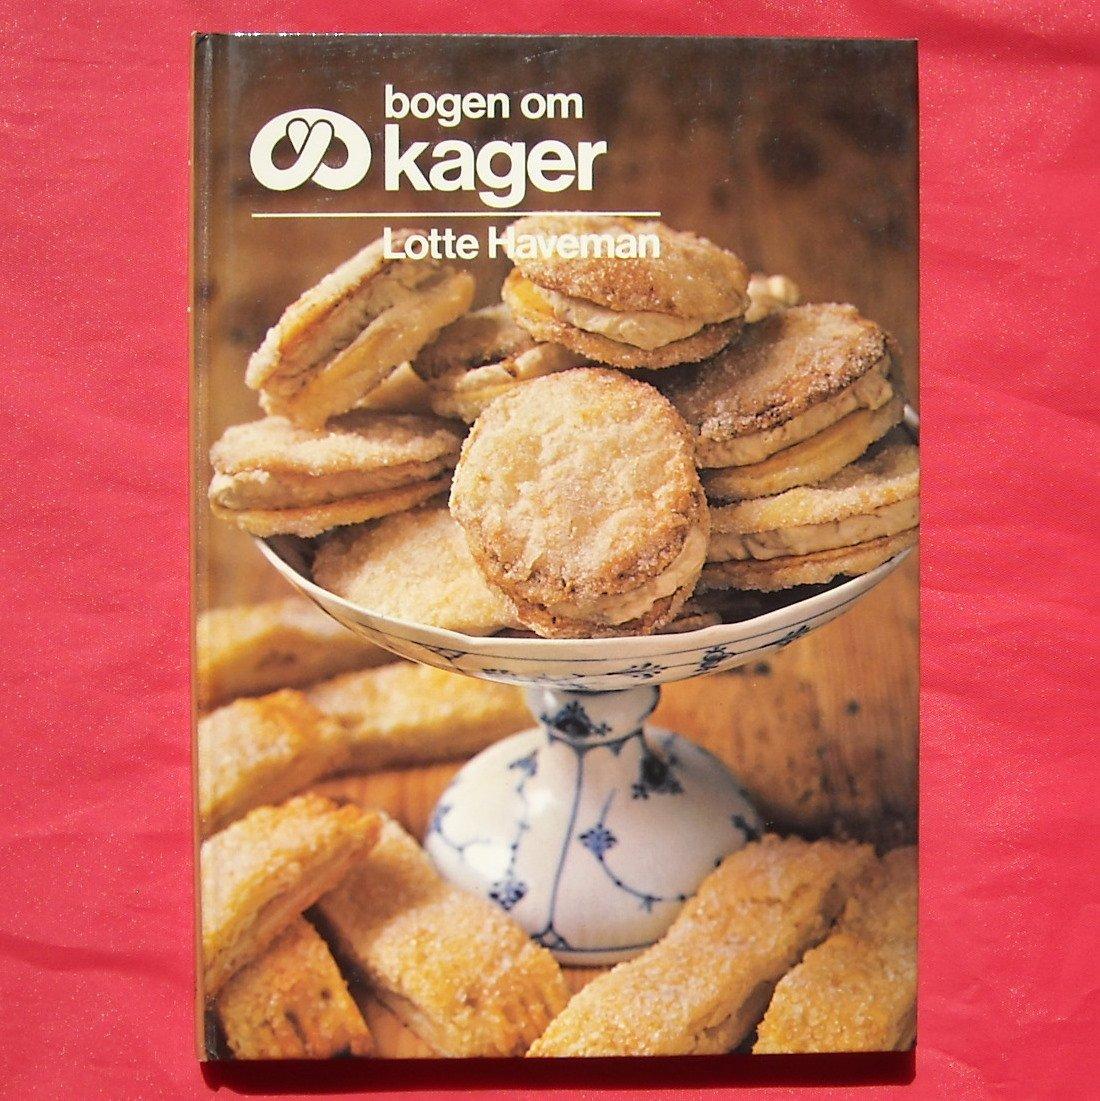 Lotte Haveman in DANISH Bogen om Kager hardcover